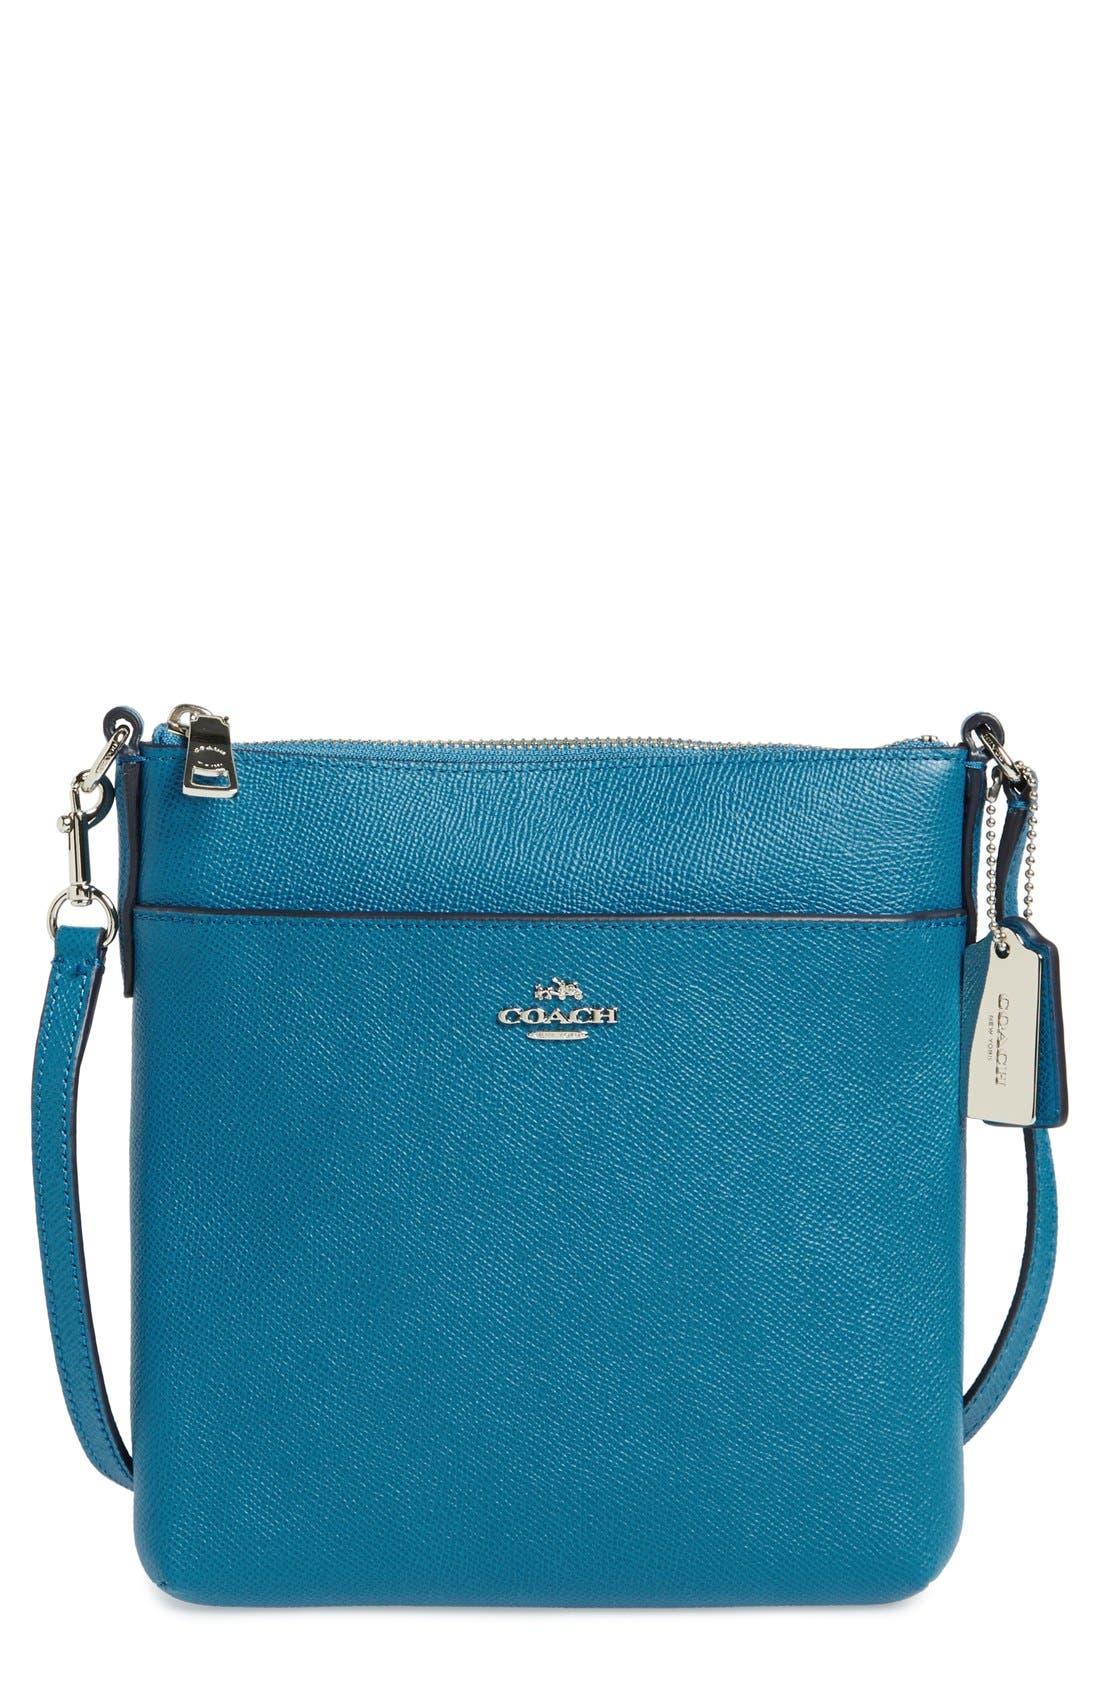 Leather Crossbody Bag,                             Main thumbnail 1, color,                             Peacock